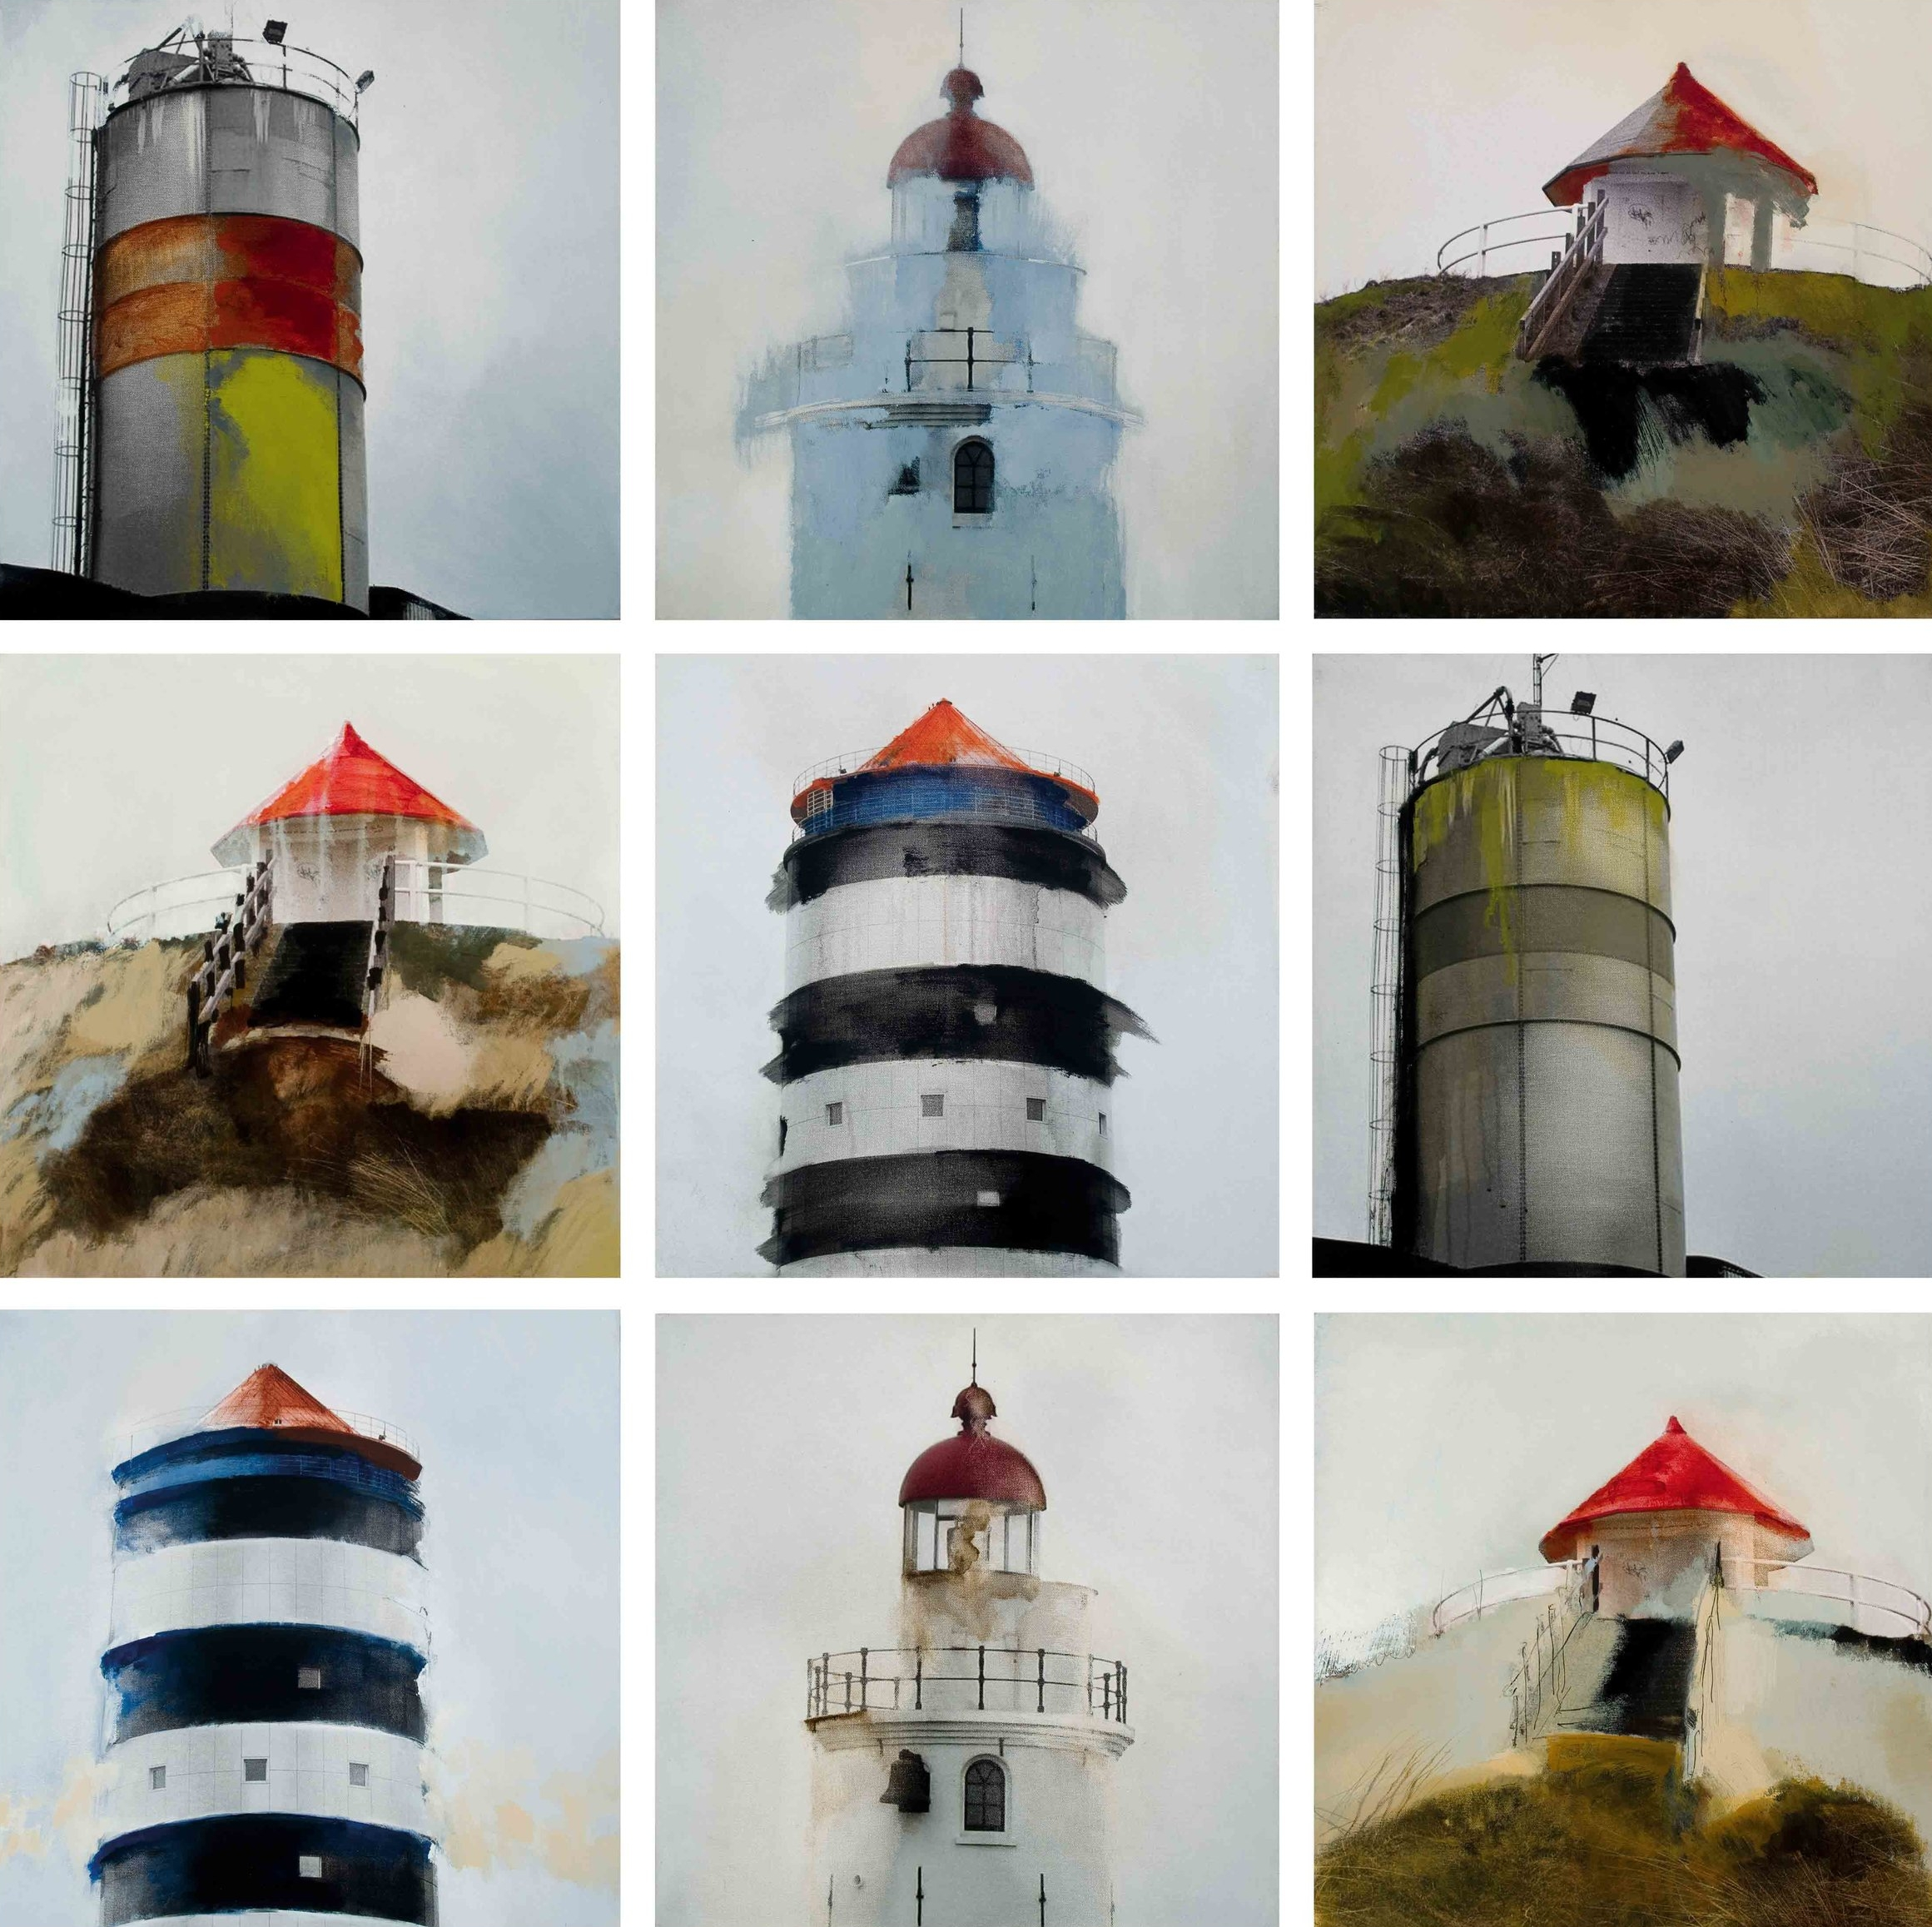 Faros, torres y chimeneas - series